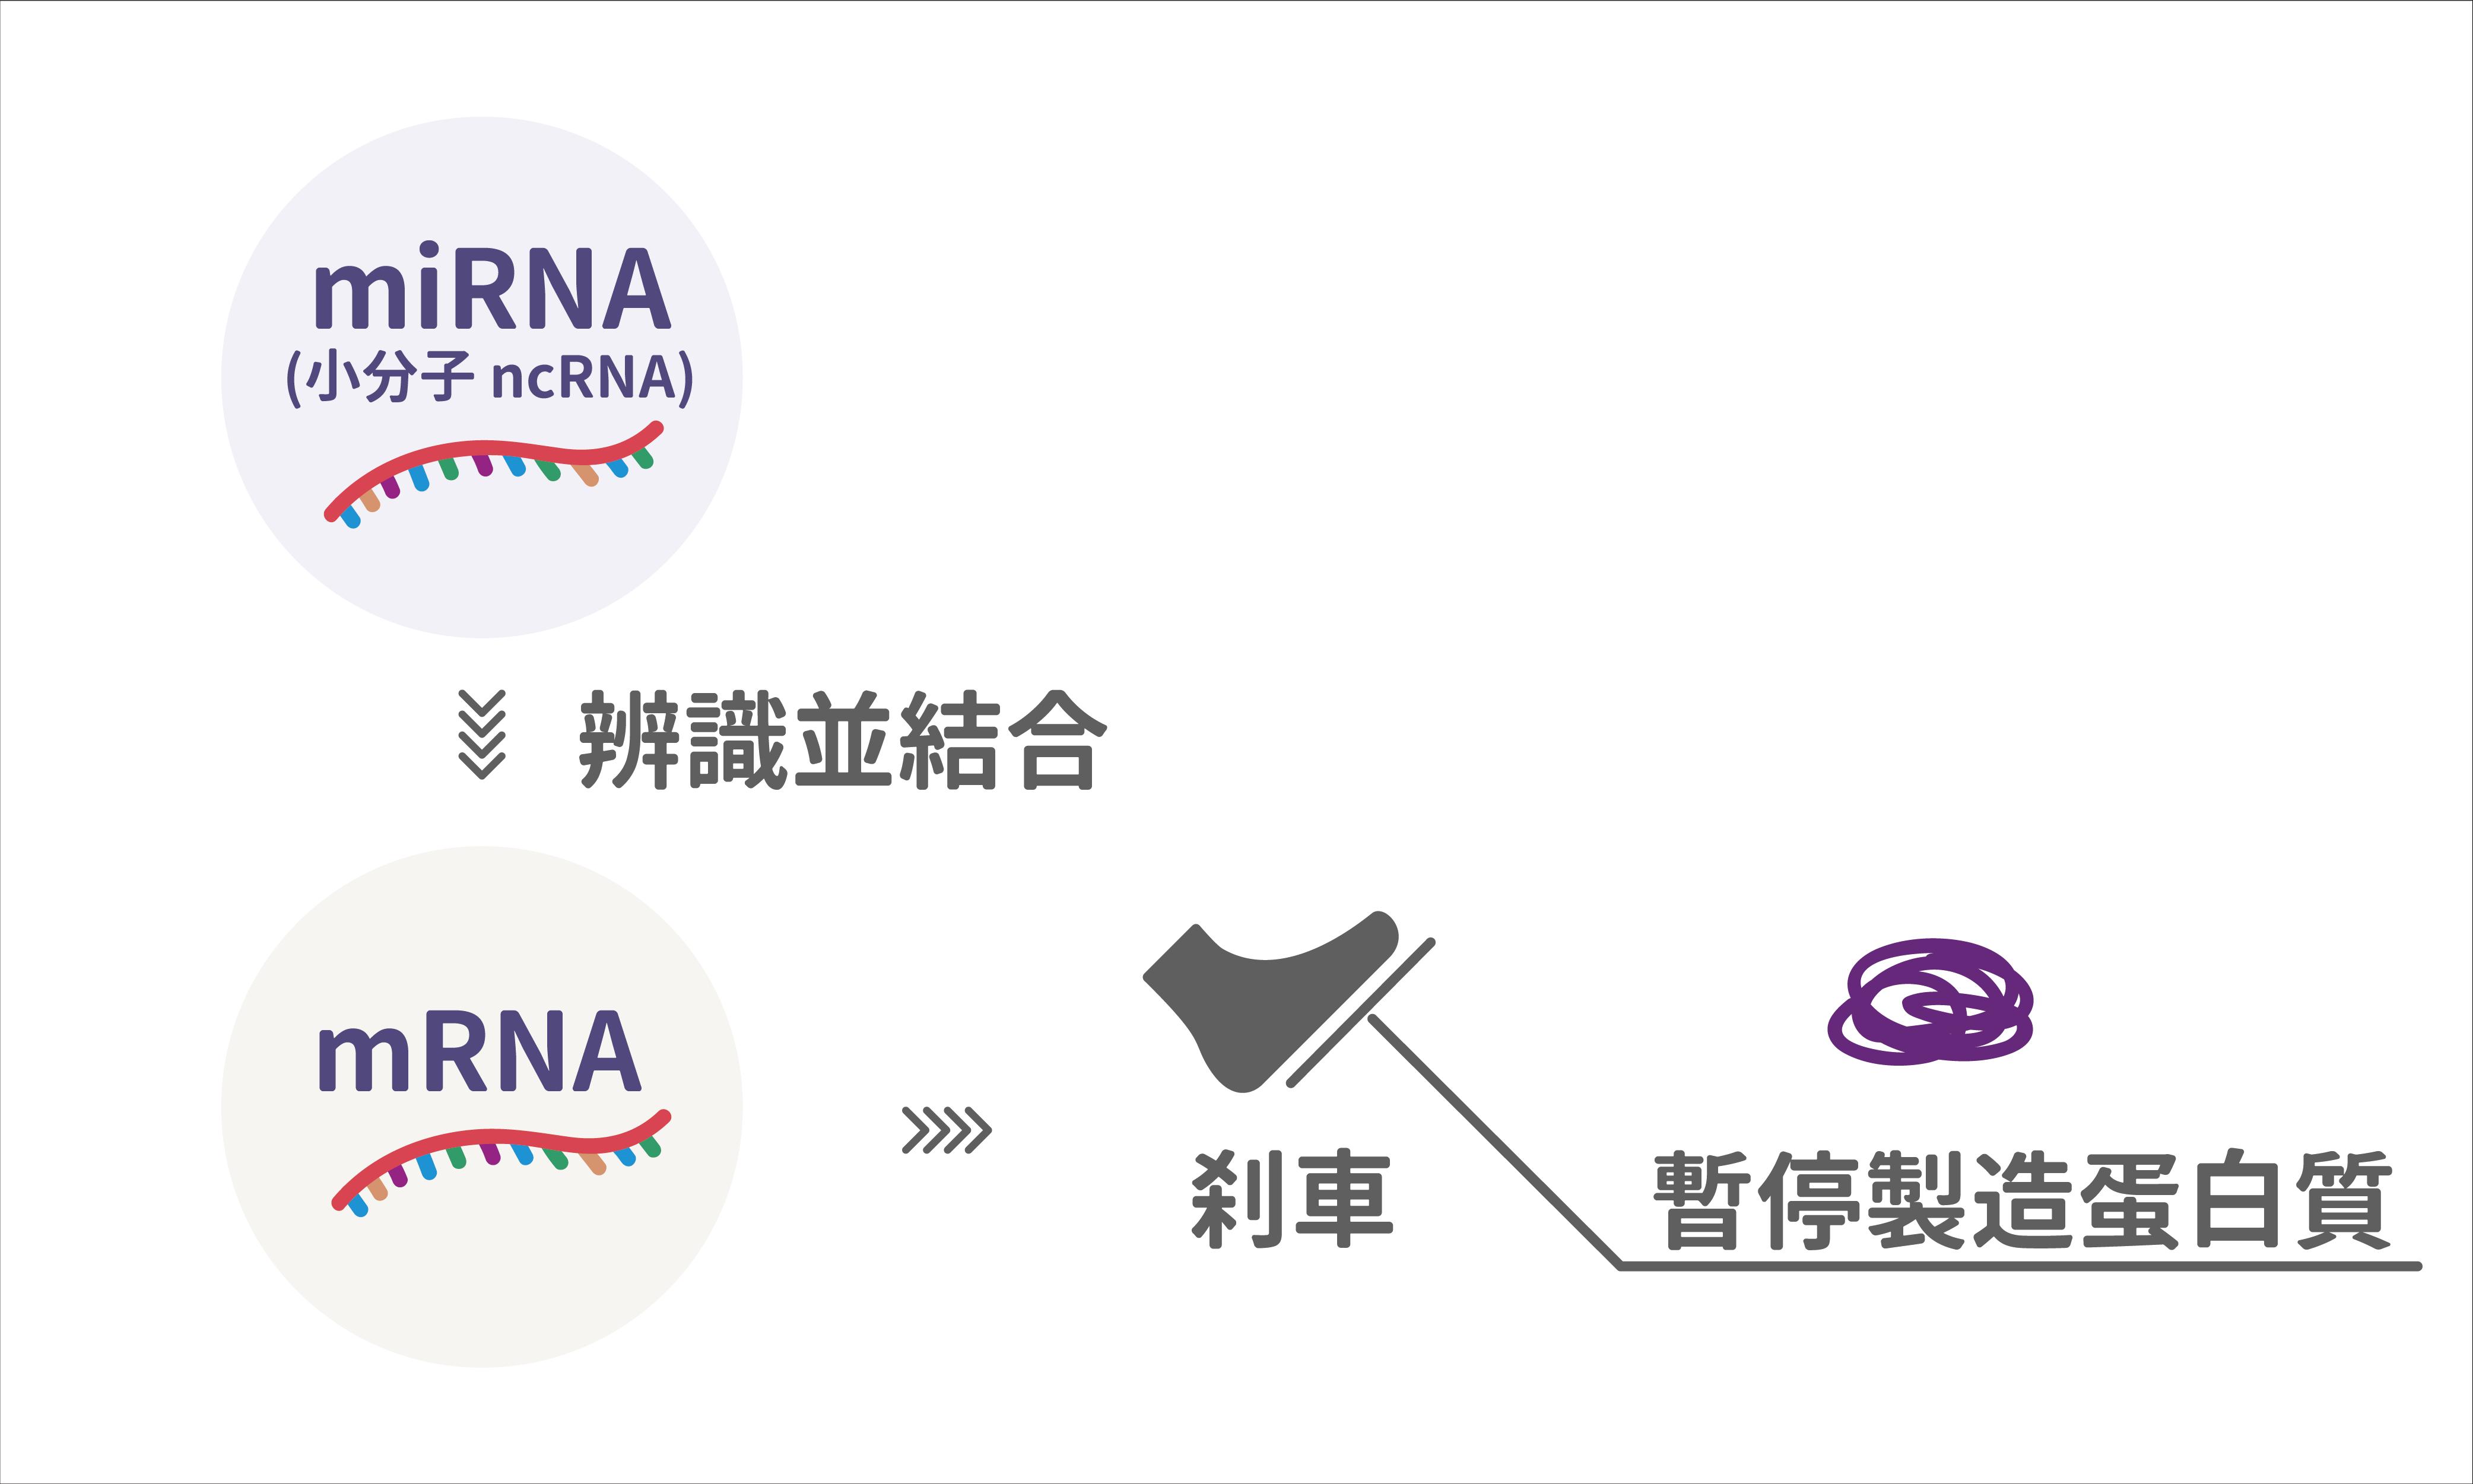 mRNA 產生太多或太少蛋白質都不好,但又不能把產生的開關關掉。microRNA 就像煞車,讓 mRNA 適時停下來,是自然界找到的調控方式。圖│研之有物